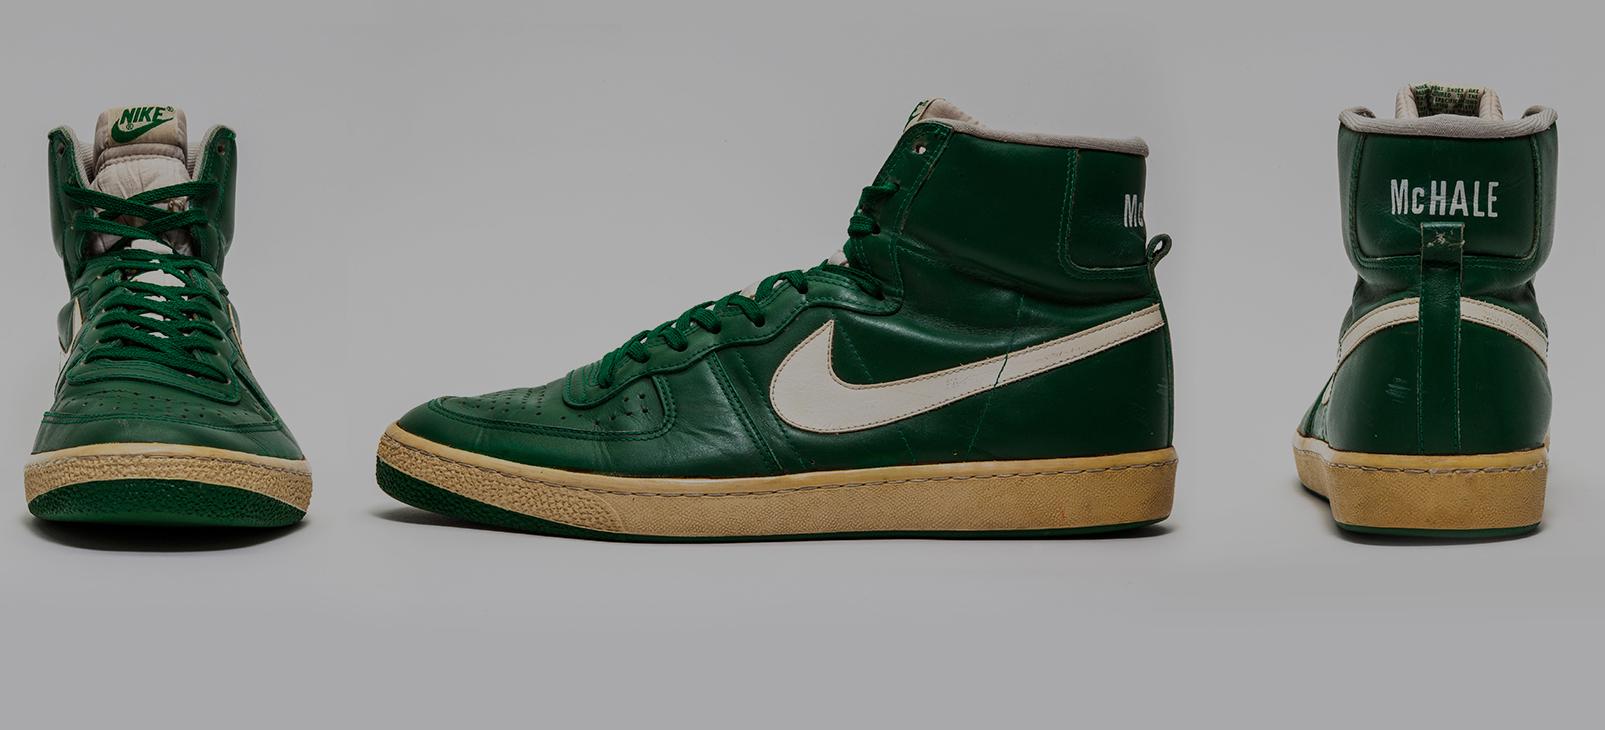 14ae67d6e3583 Vintage Nike Collectors - SneakerNews.com